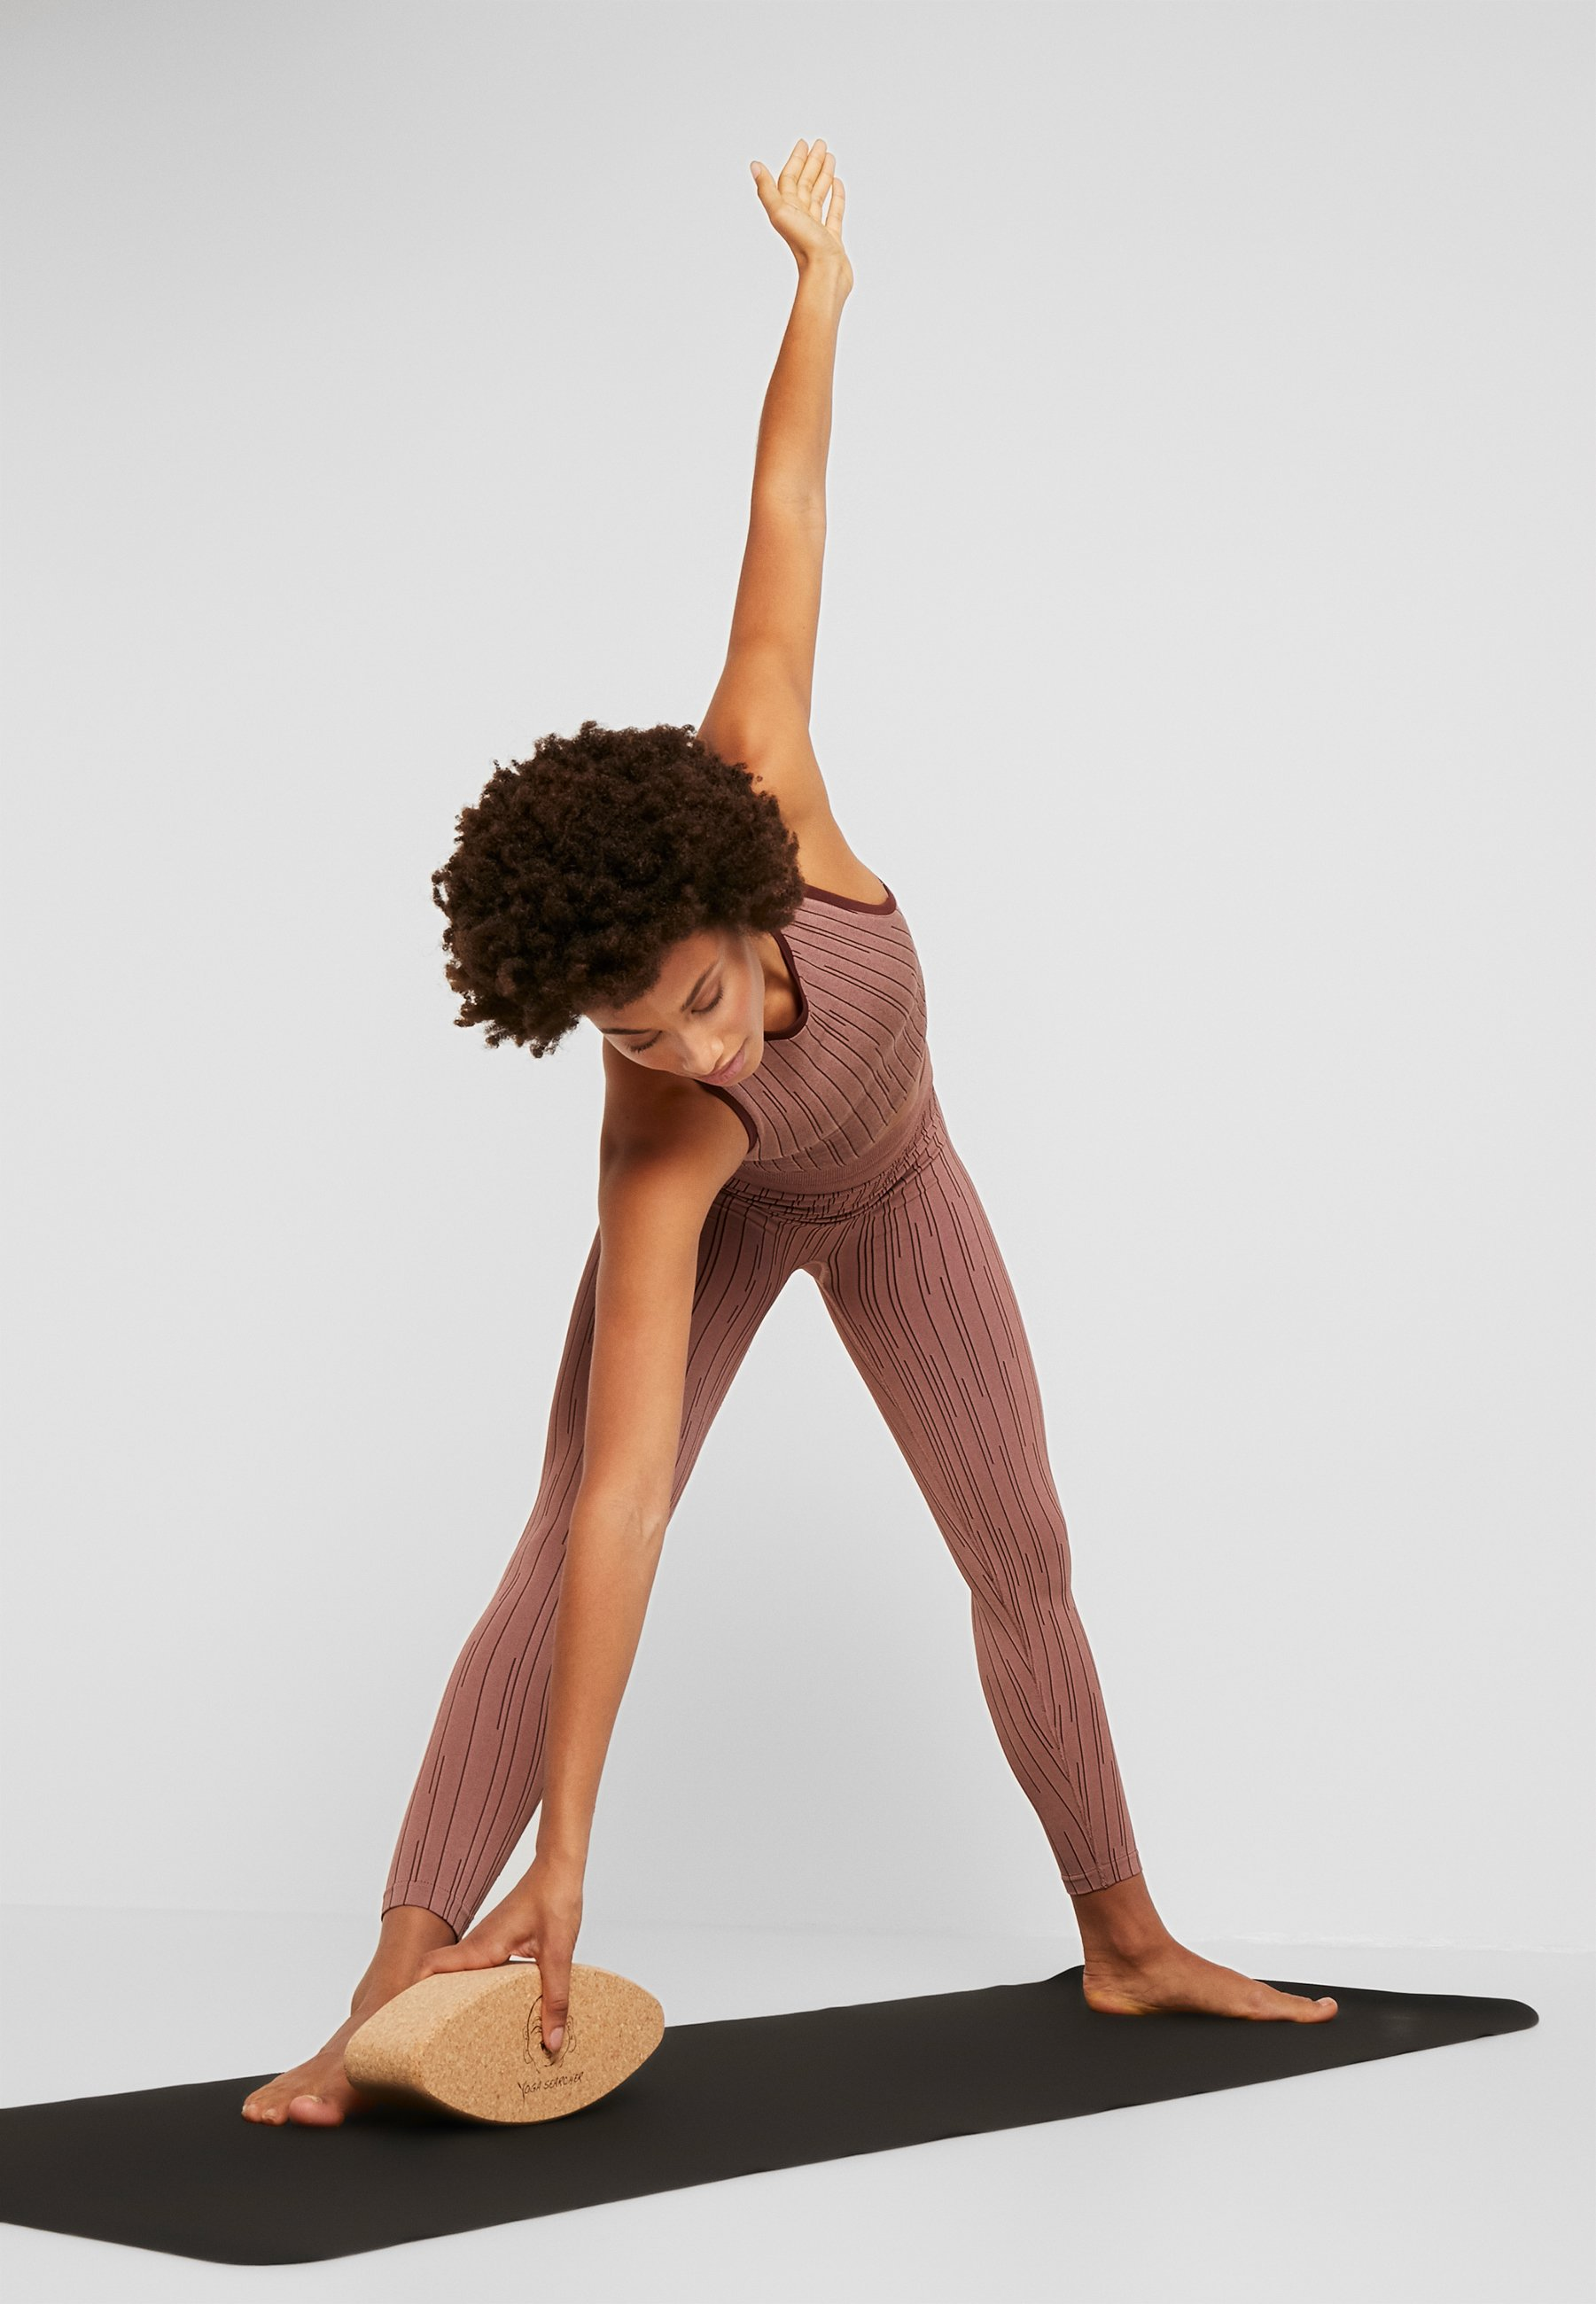 Femme OVAL YOGA BLOCK - Equipement de fitness et yoga